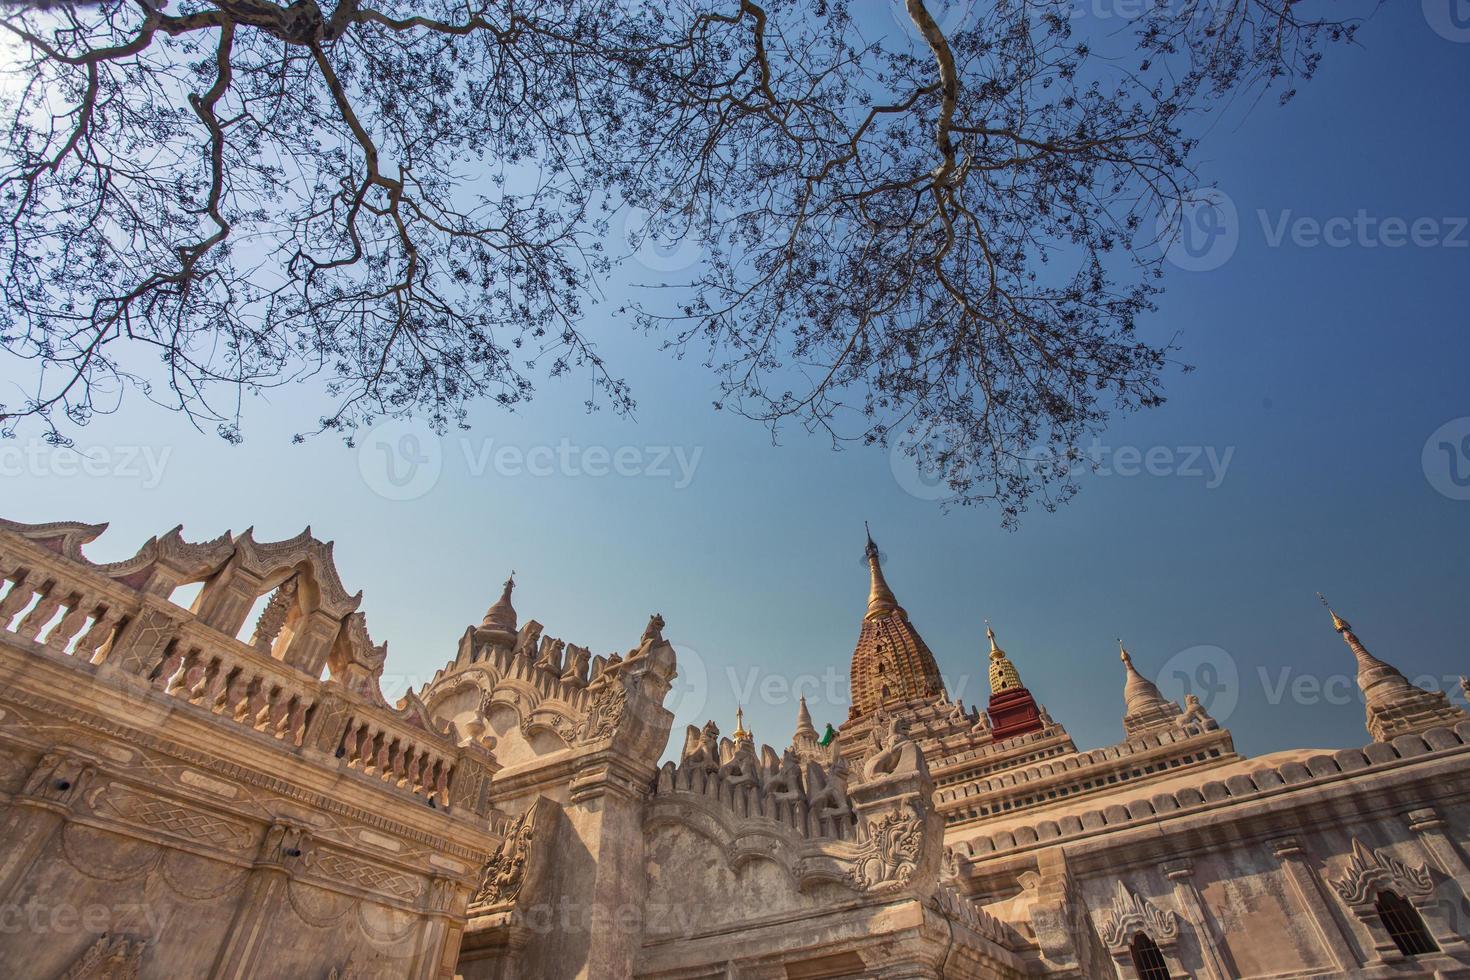 templo de ananda no céu azul foto